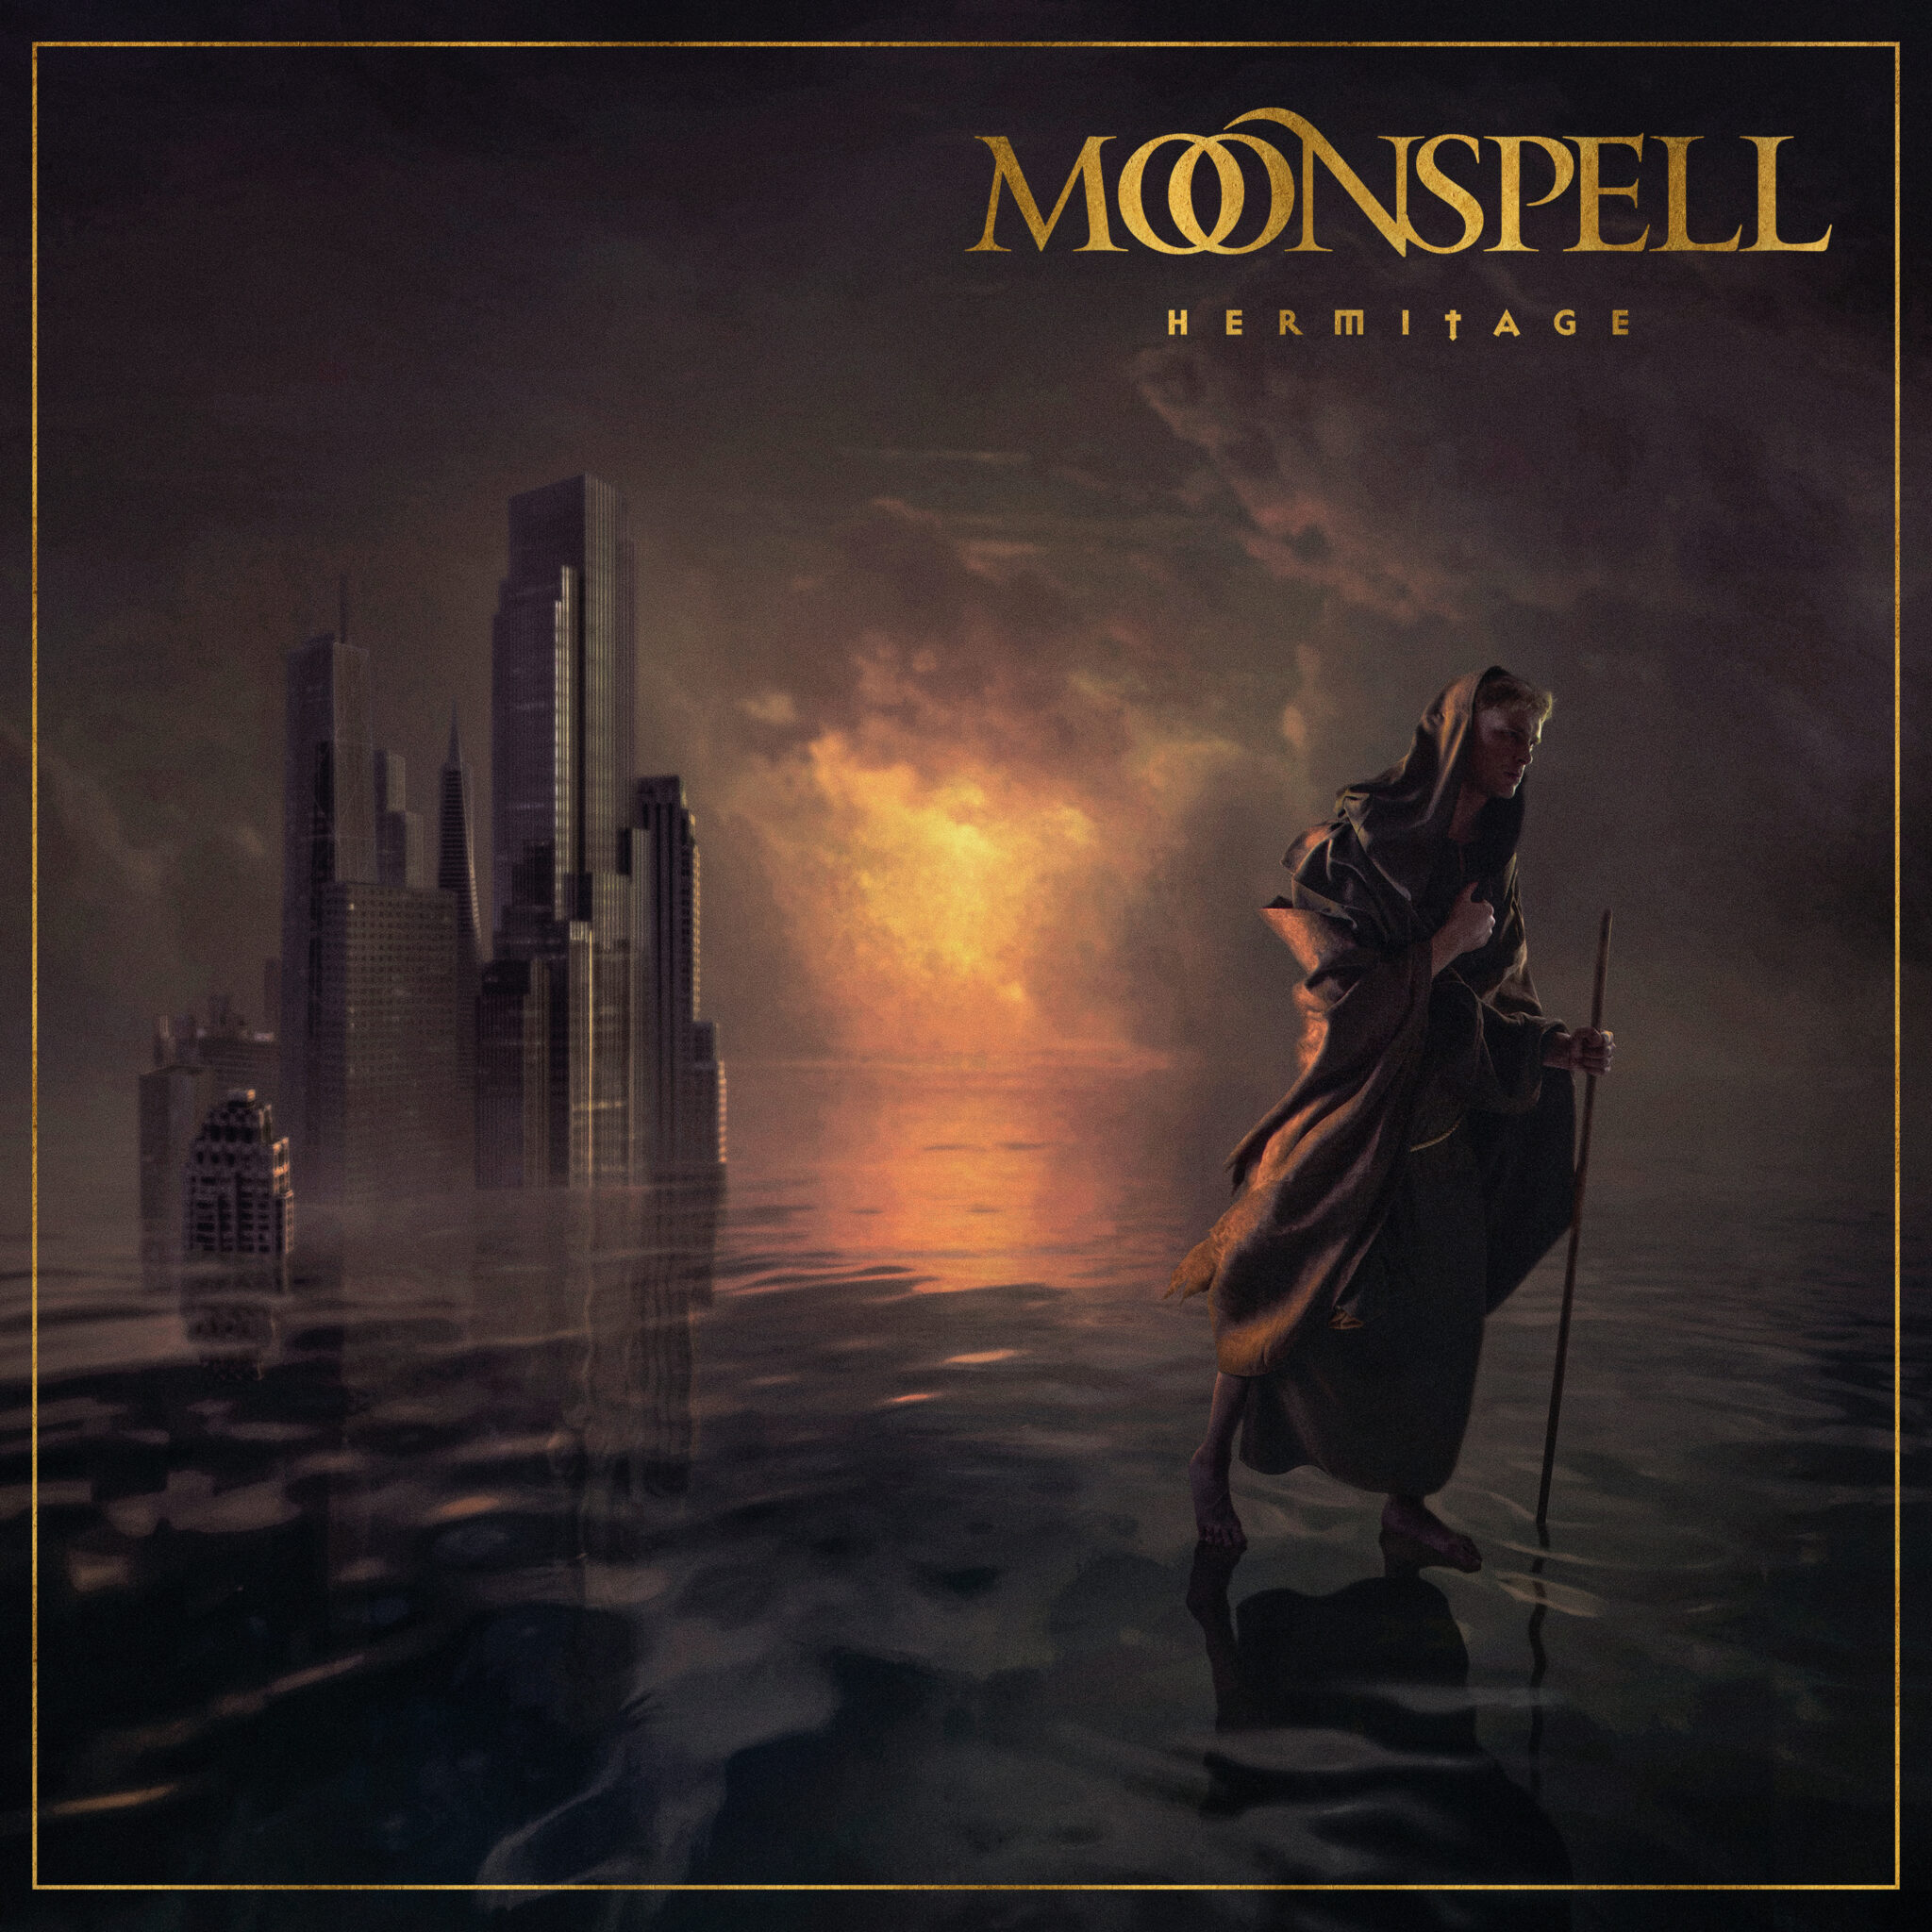 Moonspell: Hermitage